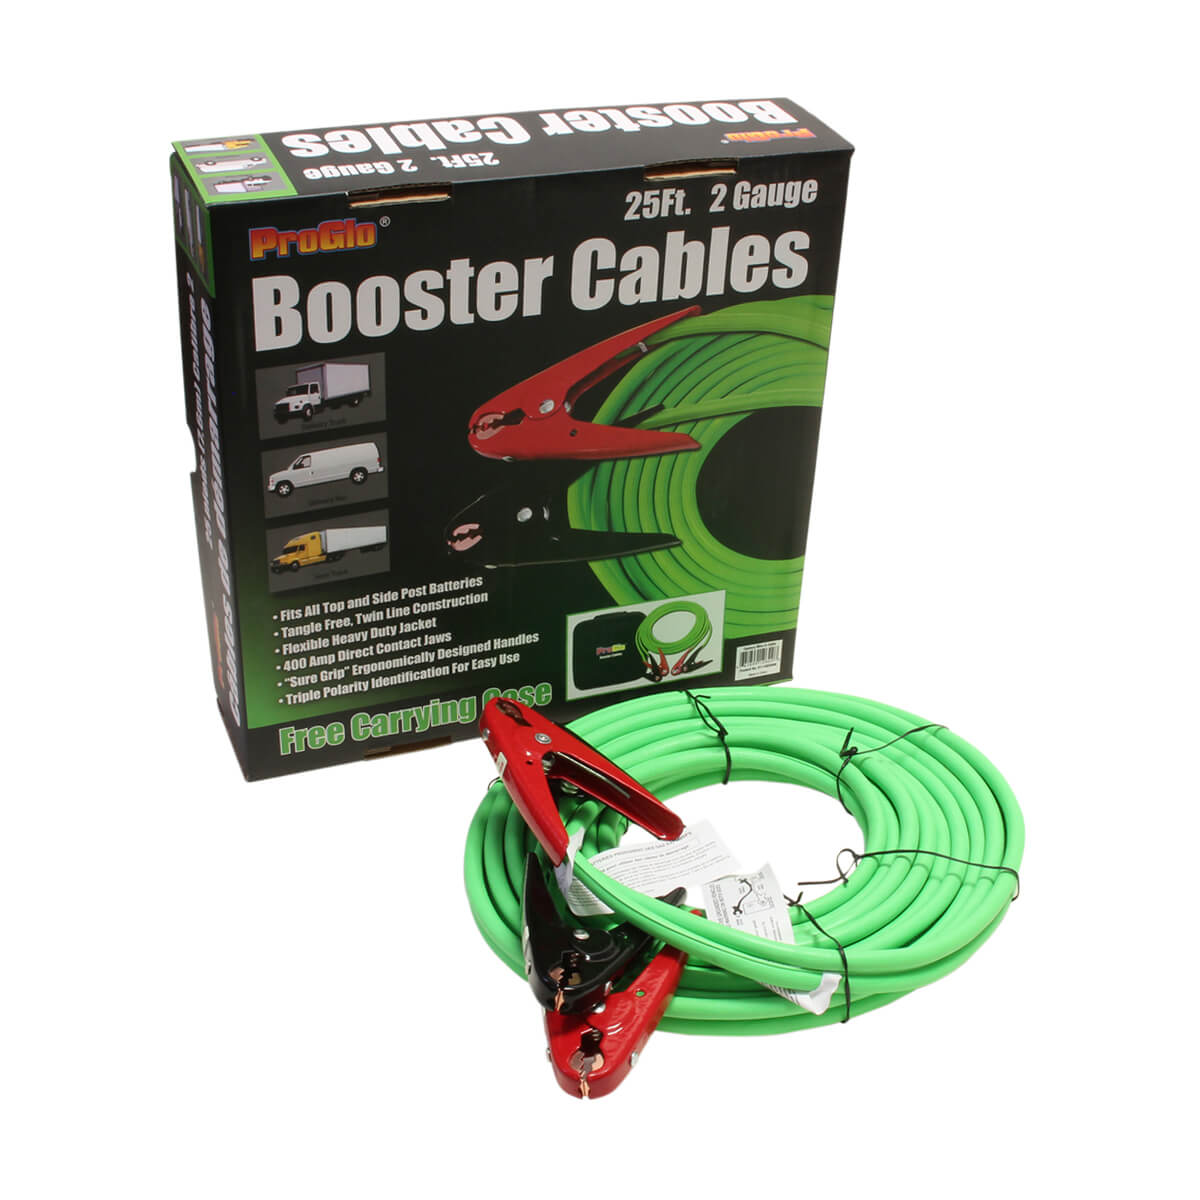 25' Pro Glo® Booster Cables, 2 Ga. w/Case